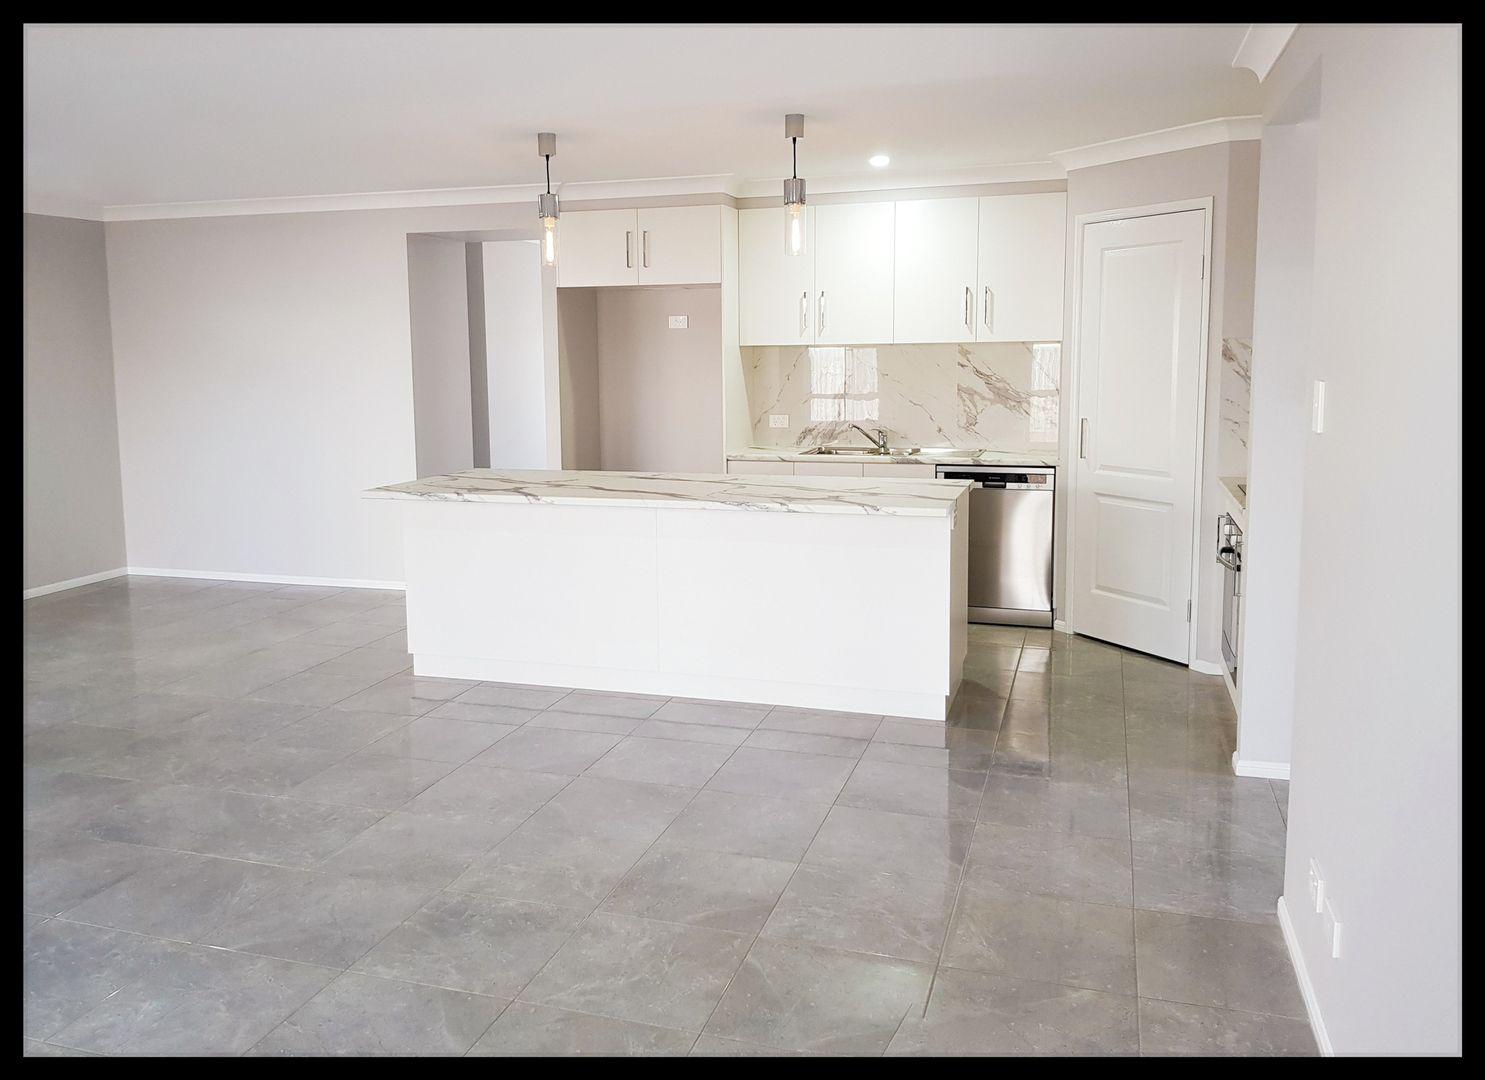 1/6 Farrer Street, Cranley QLD 4350, Image 2